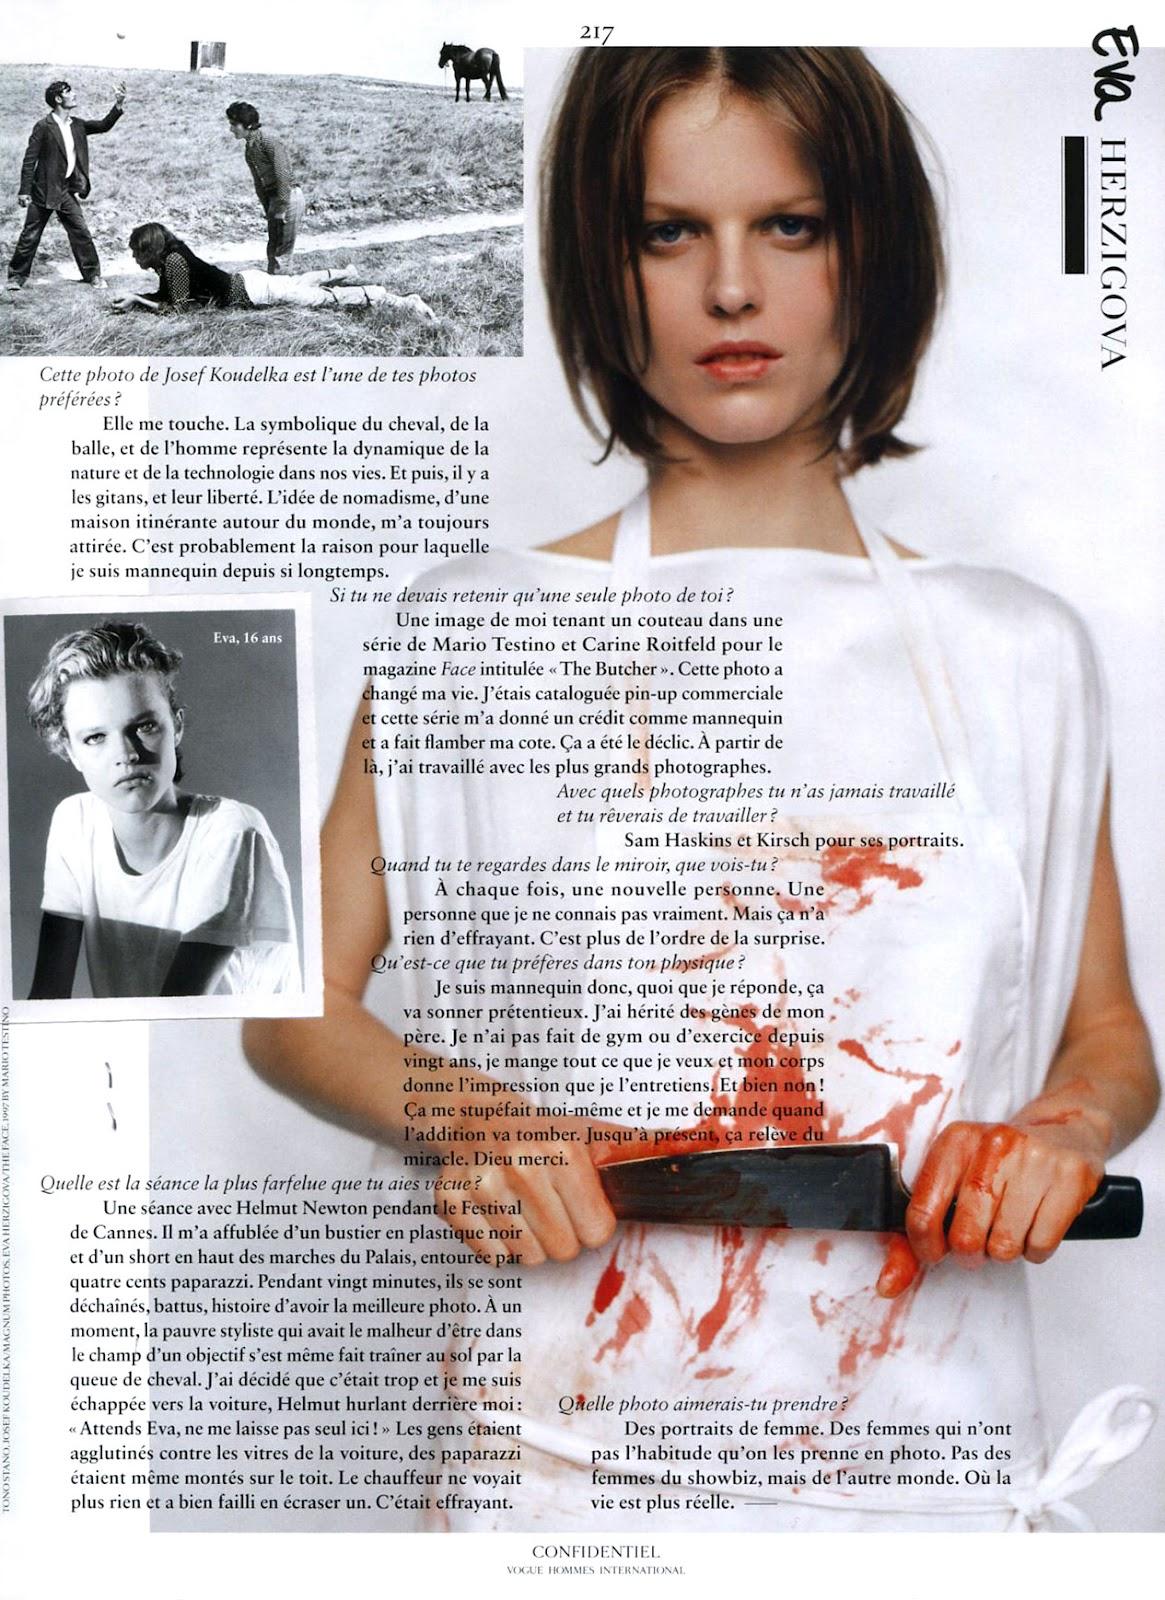 http://3.bp.blogspot.com/-cmeH_3dHqQ8/T3sfjbznBII/AAAAAAAAG44/_4Kfs0R9-T8/s1600/Eva+Herzigova+2009-10+FW+Vogue+Hommes+International+Fr+Ph+Mario+Testino.jpg